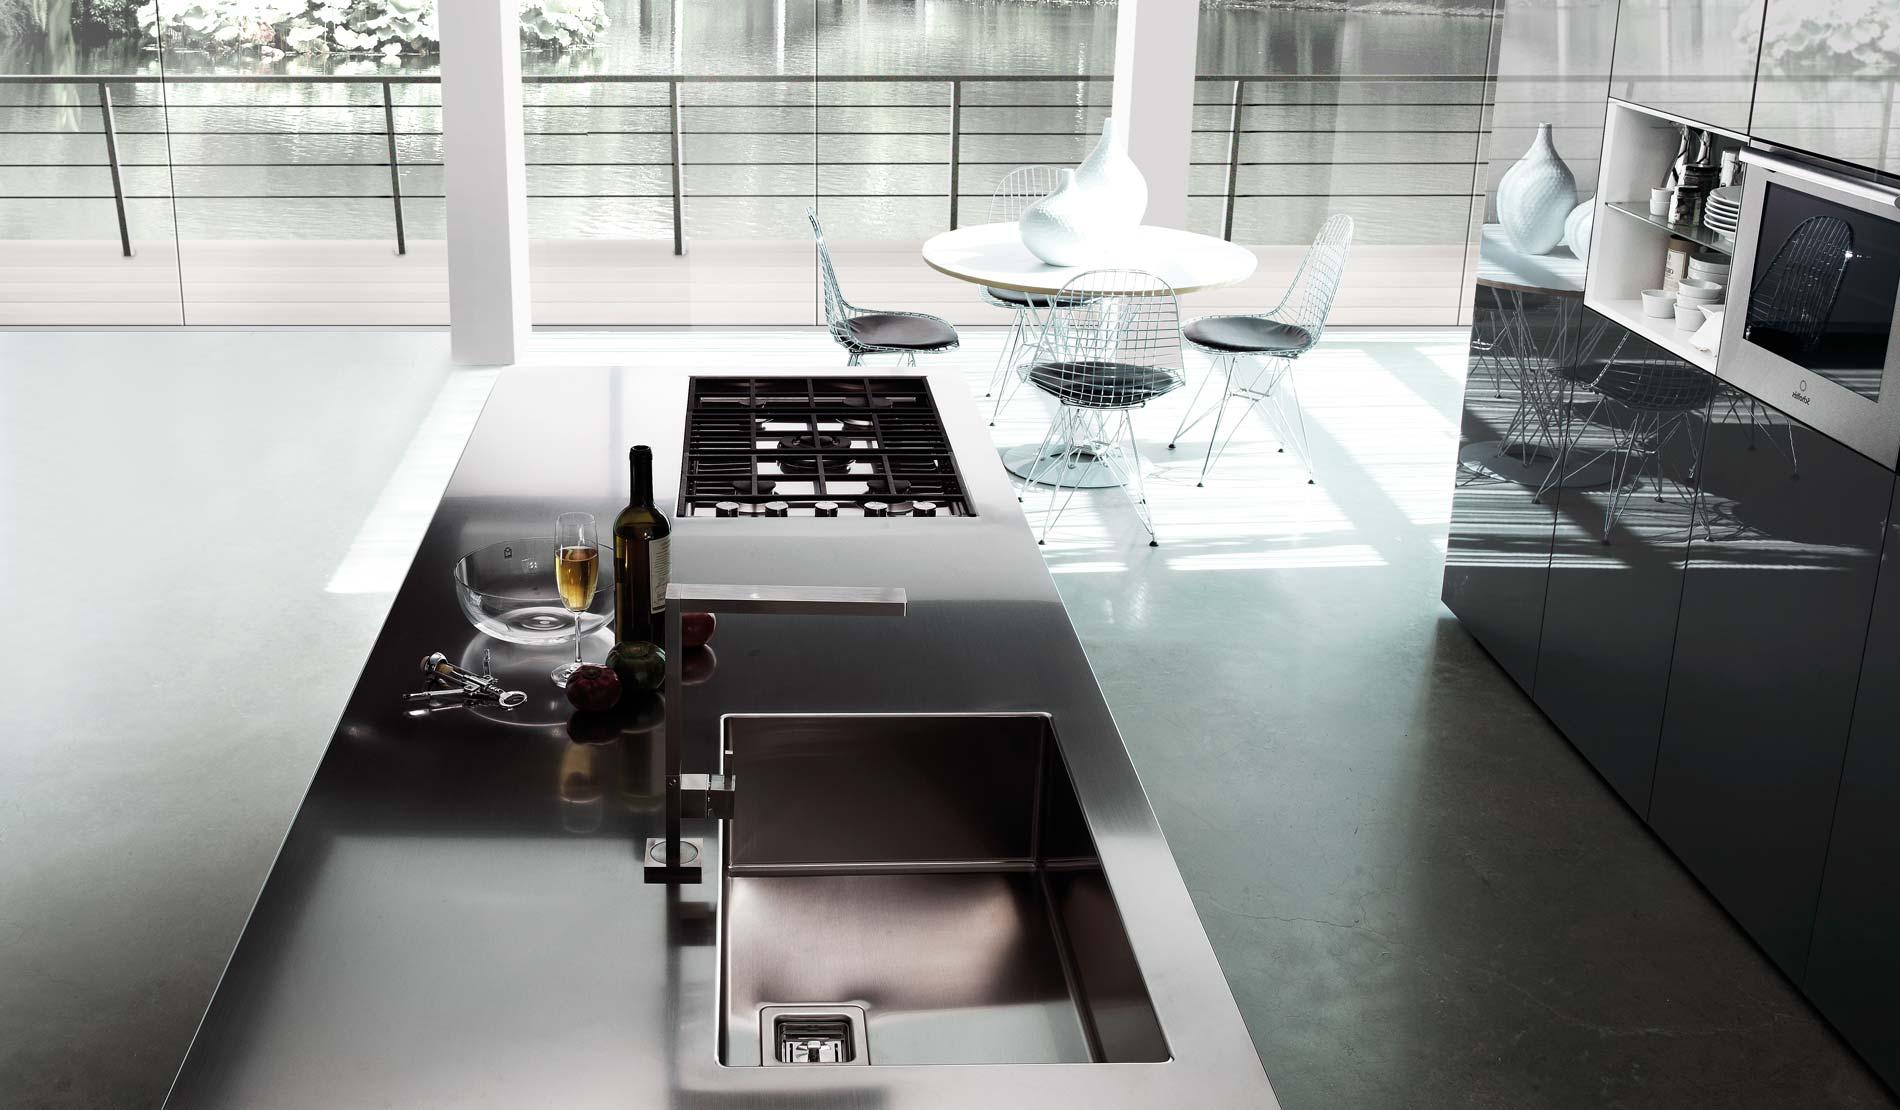 cuisiniste toulouse artisan cuisine inconcept cuisiniste. Black Bedroom Furniture Sets. Home Design Ideas